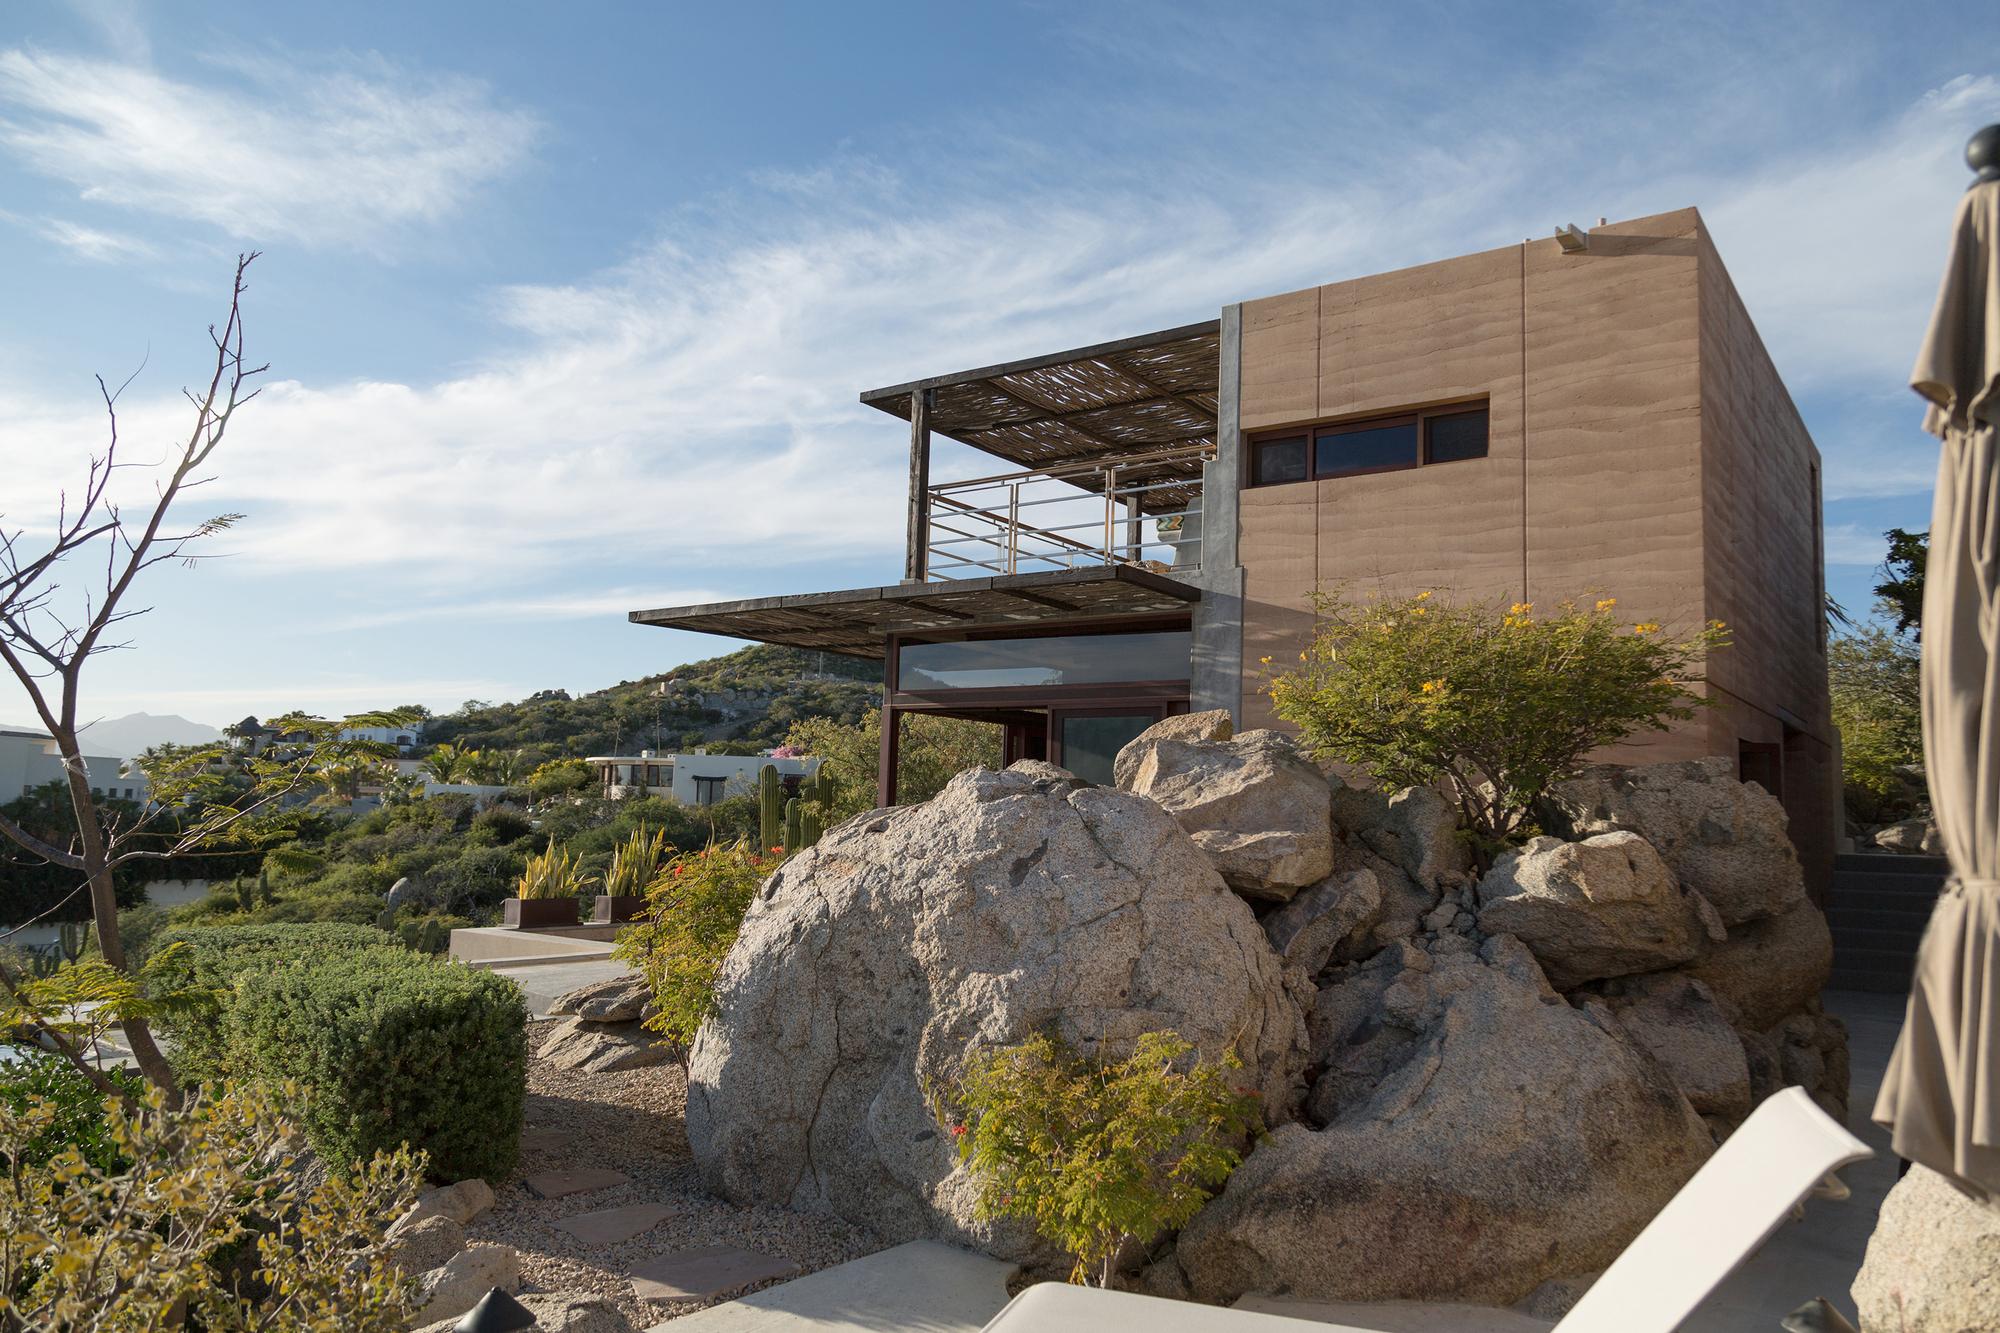 Big Rock House / FabrikG